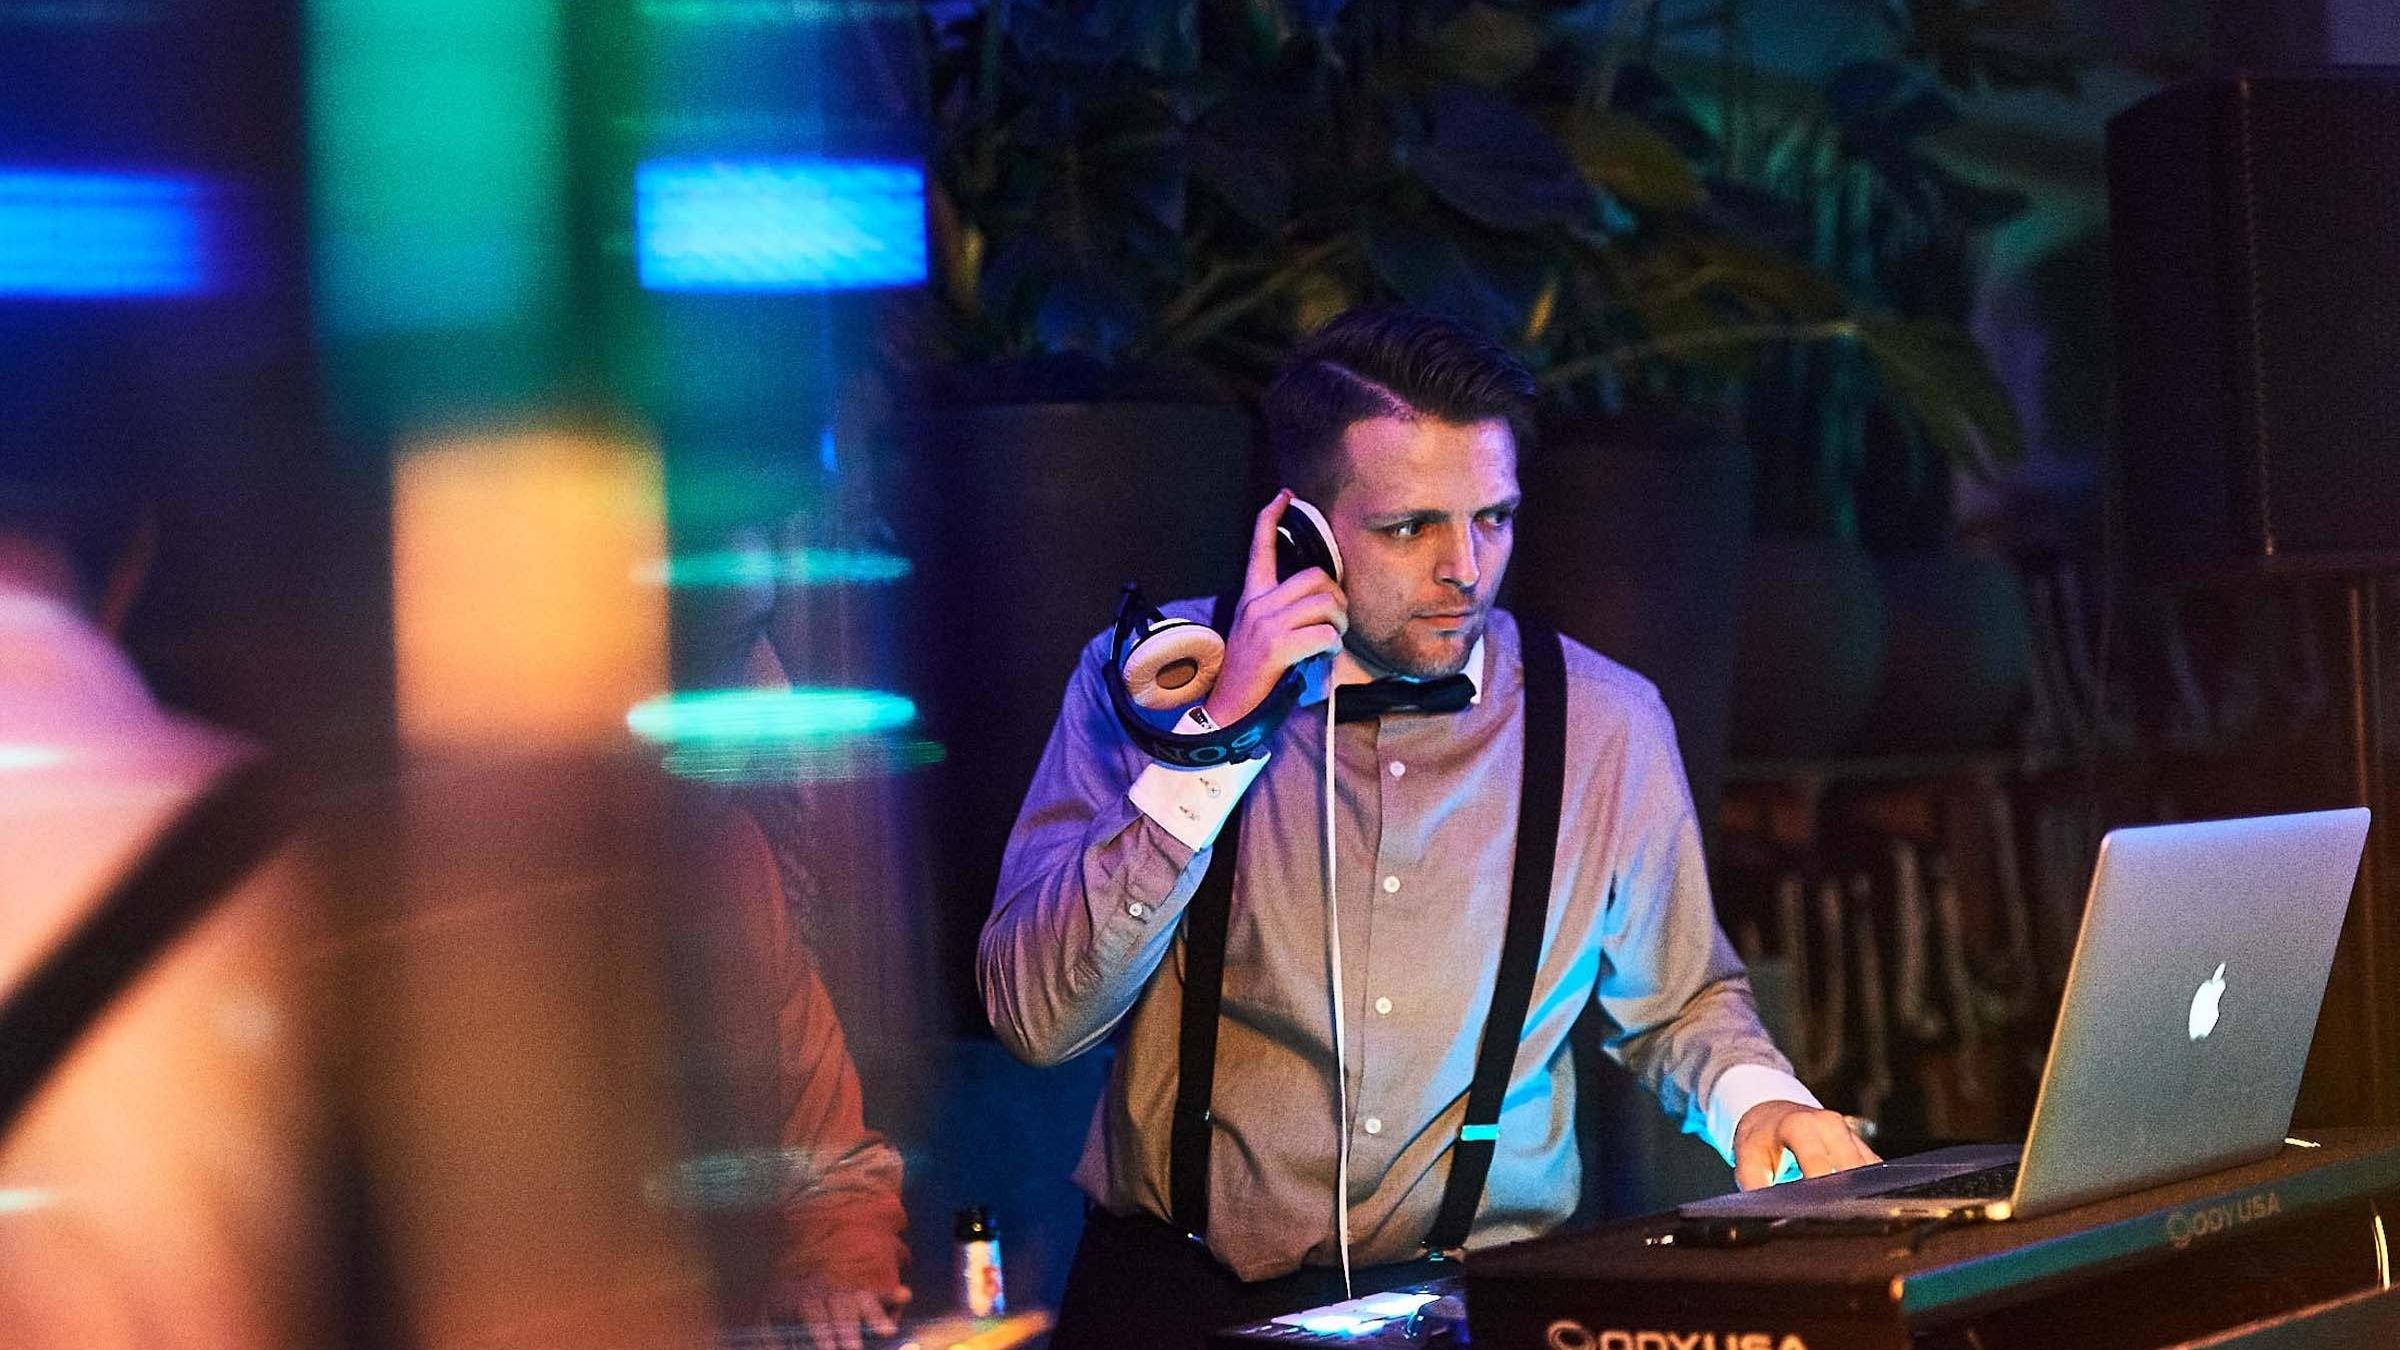 Barformat | Partner | Lehmann-Eventservice | DJ | Hannover | Timm-Lehmann | Lehmann-Eventservice | Buchen | Mieten | Anfragen